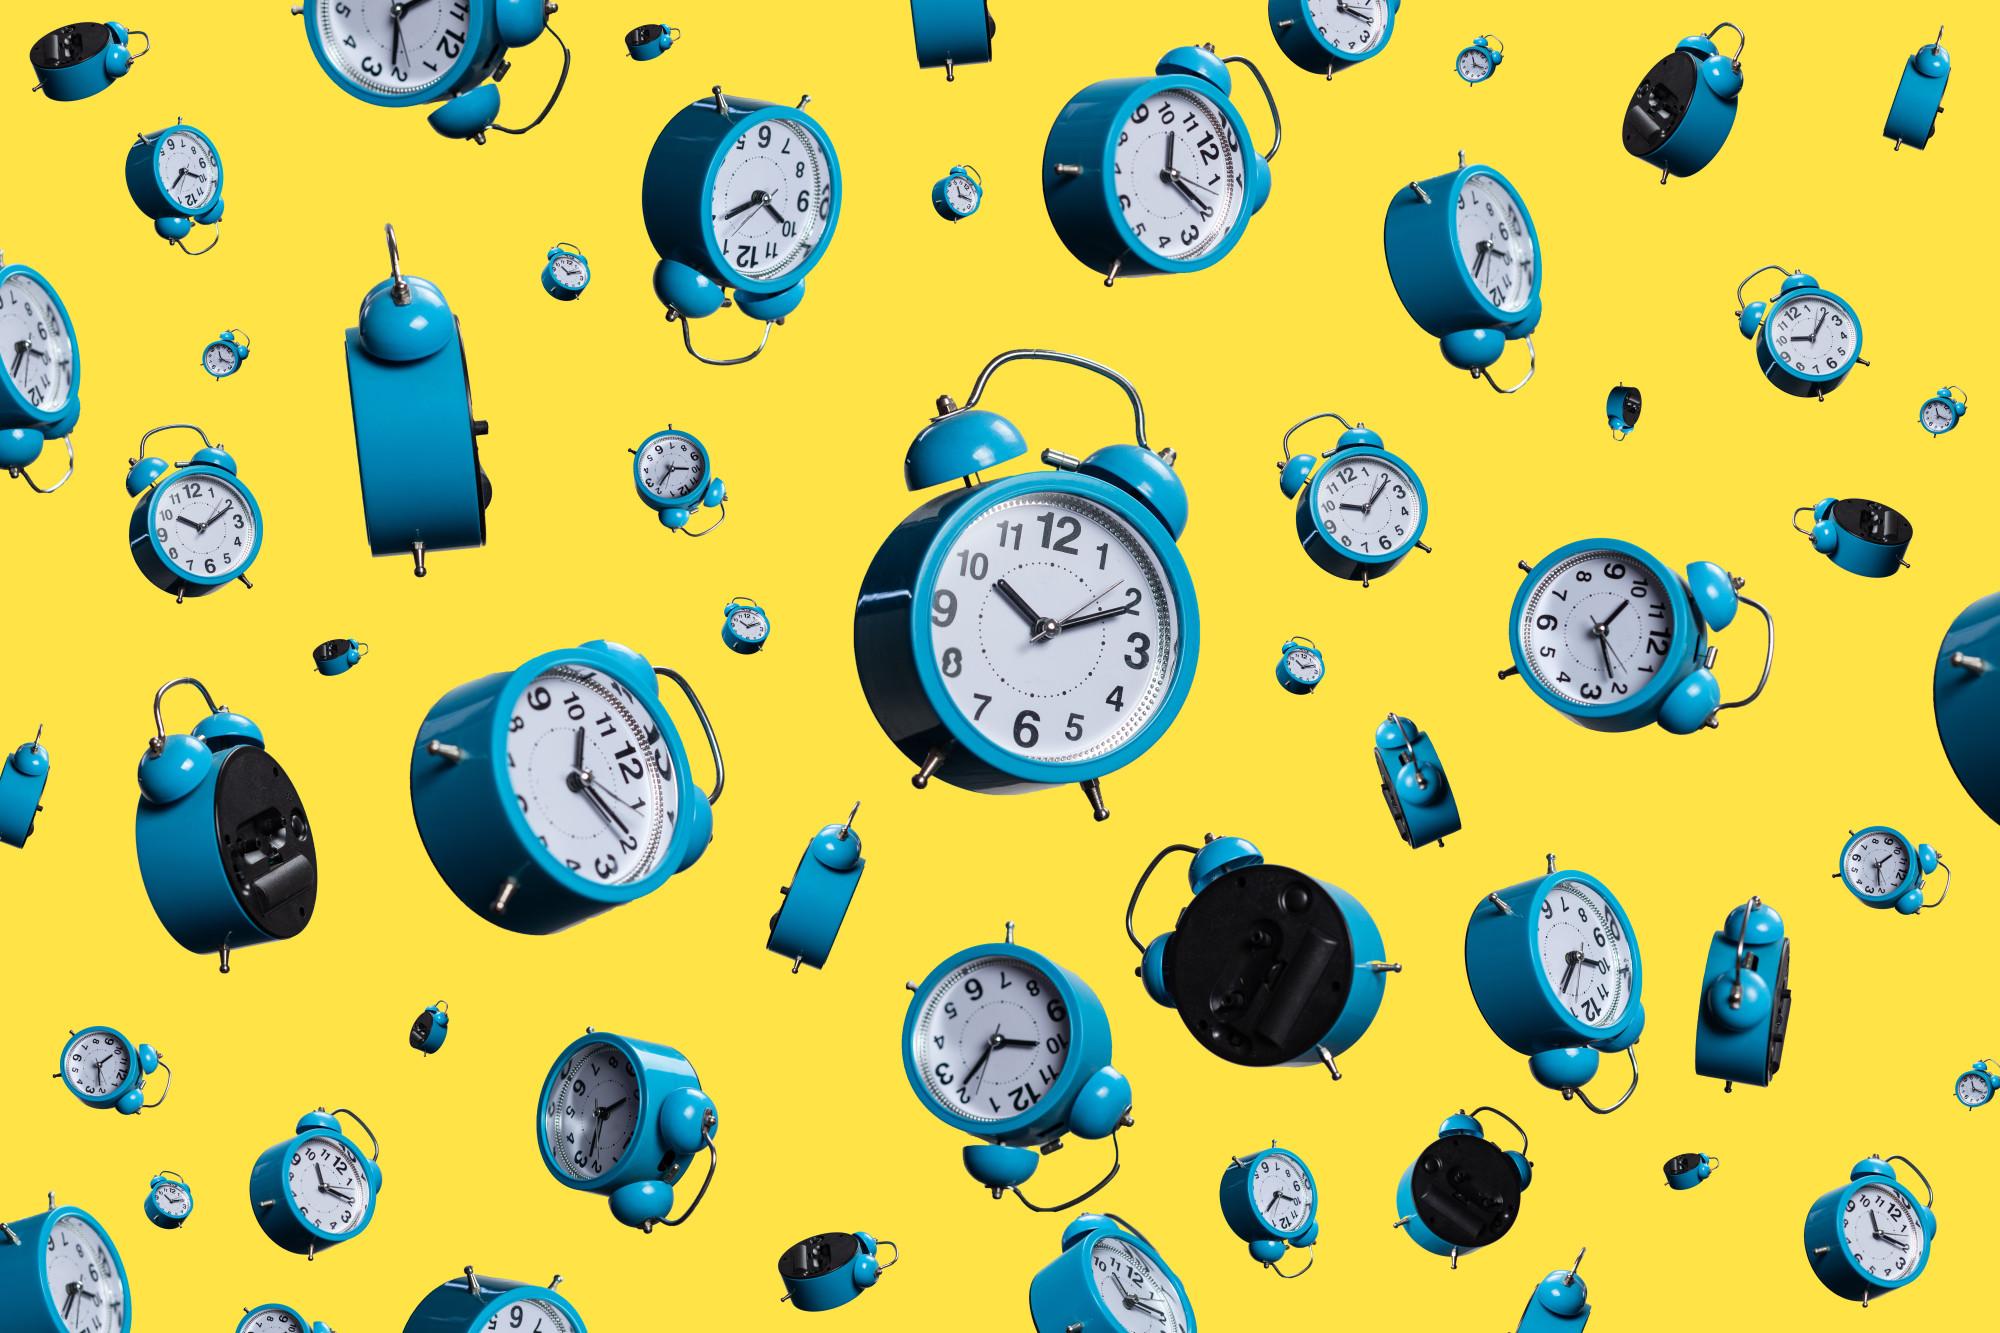 alarm clocks on yellow background